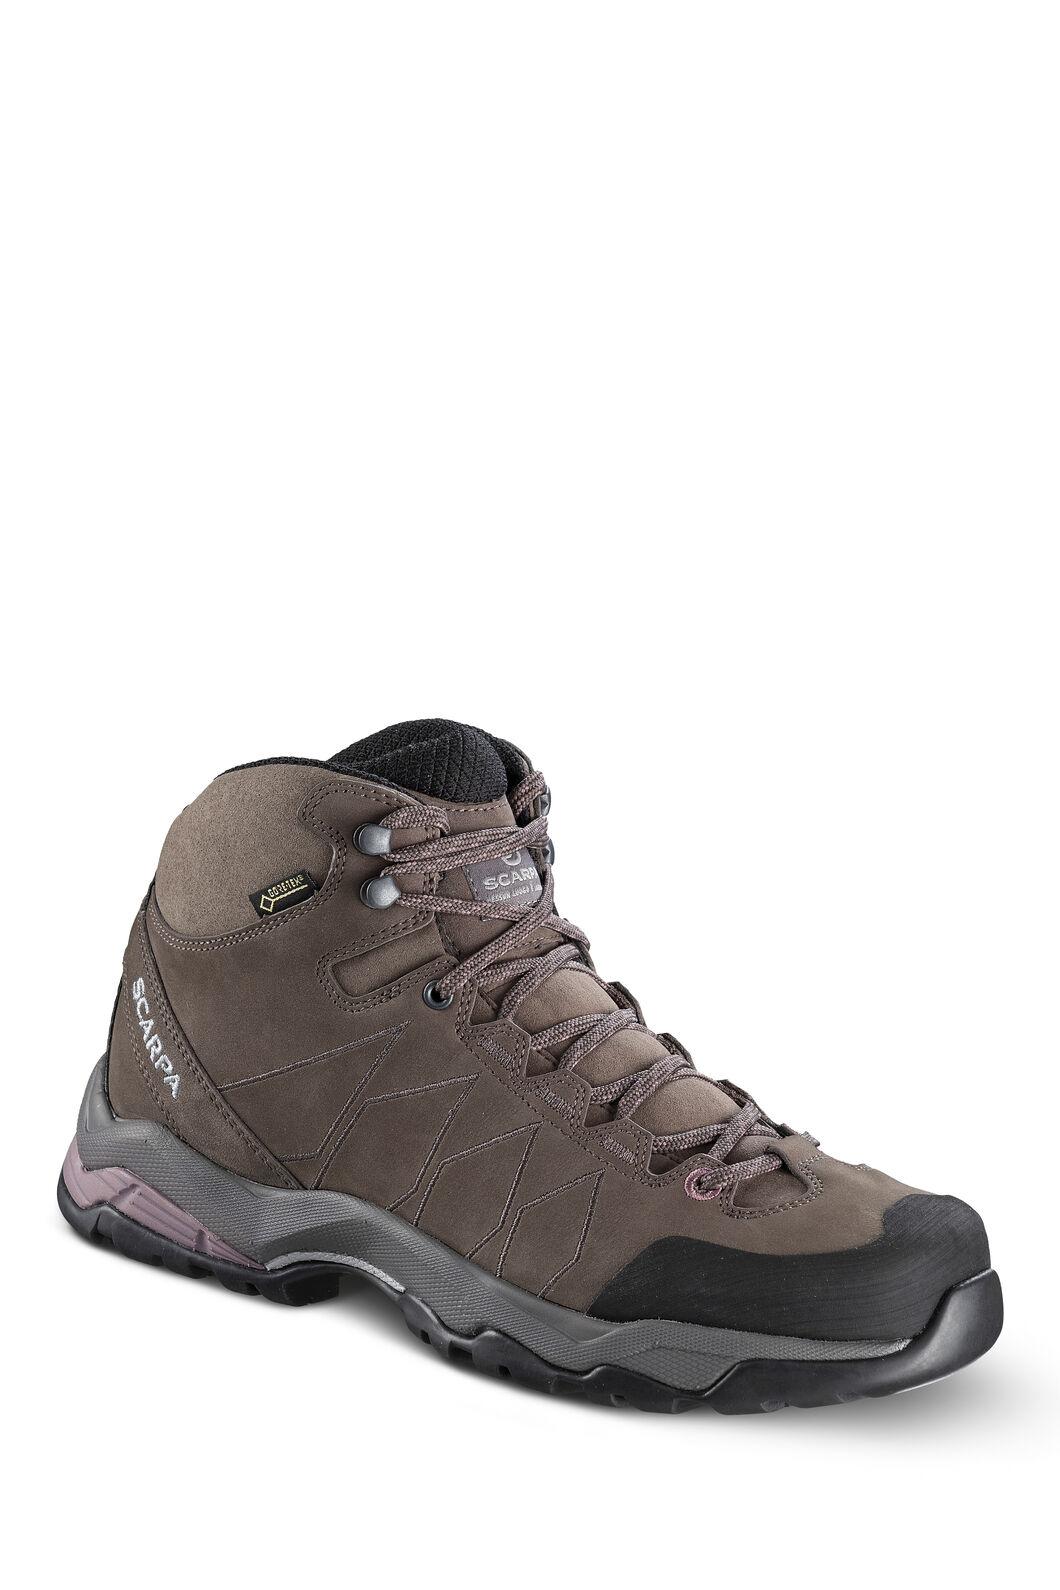 Scarpa Moraine Plus GTX Hiking Boot - Women's, Charcoal/Dark Plum, hi-res